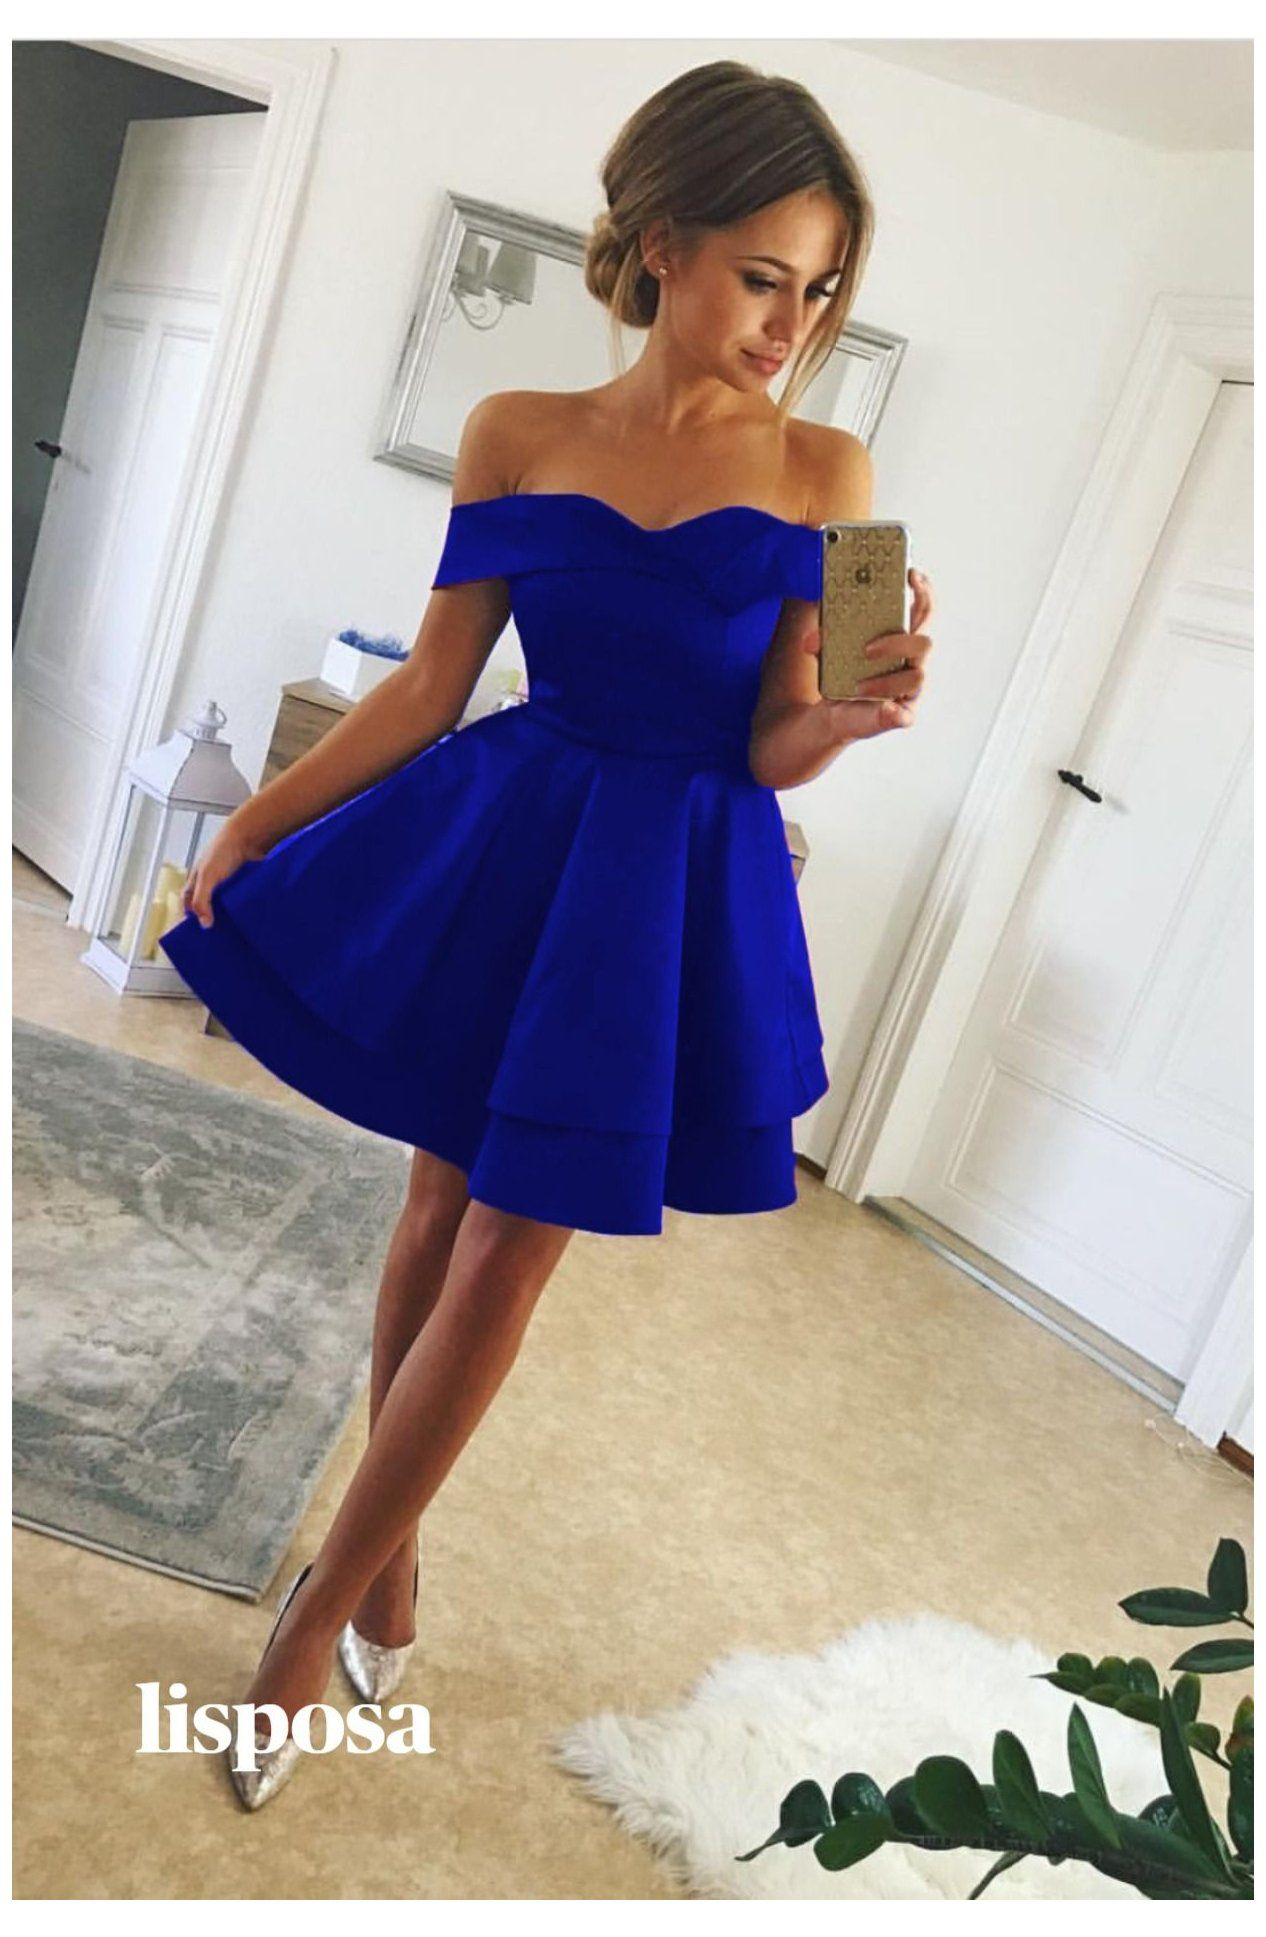 Royal Blue Homecoming Dresses Satin Royal Blue Formal Dress Short Royal In 2021 Royal Blue Prom Dress Short Royal Blue Homecoming Dresses Prom Dresses Short Blue [ 1937 x 1266 Pixel ]